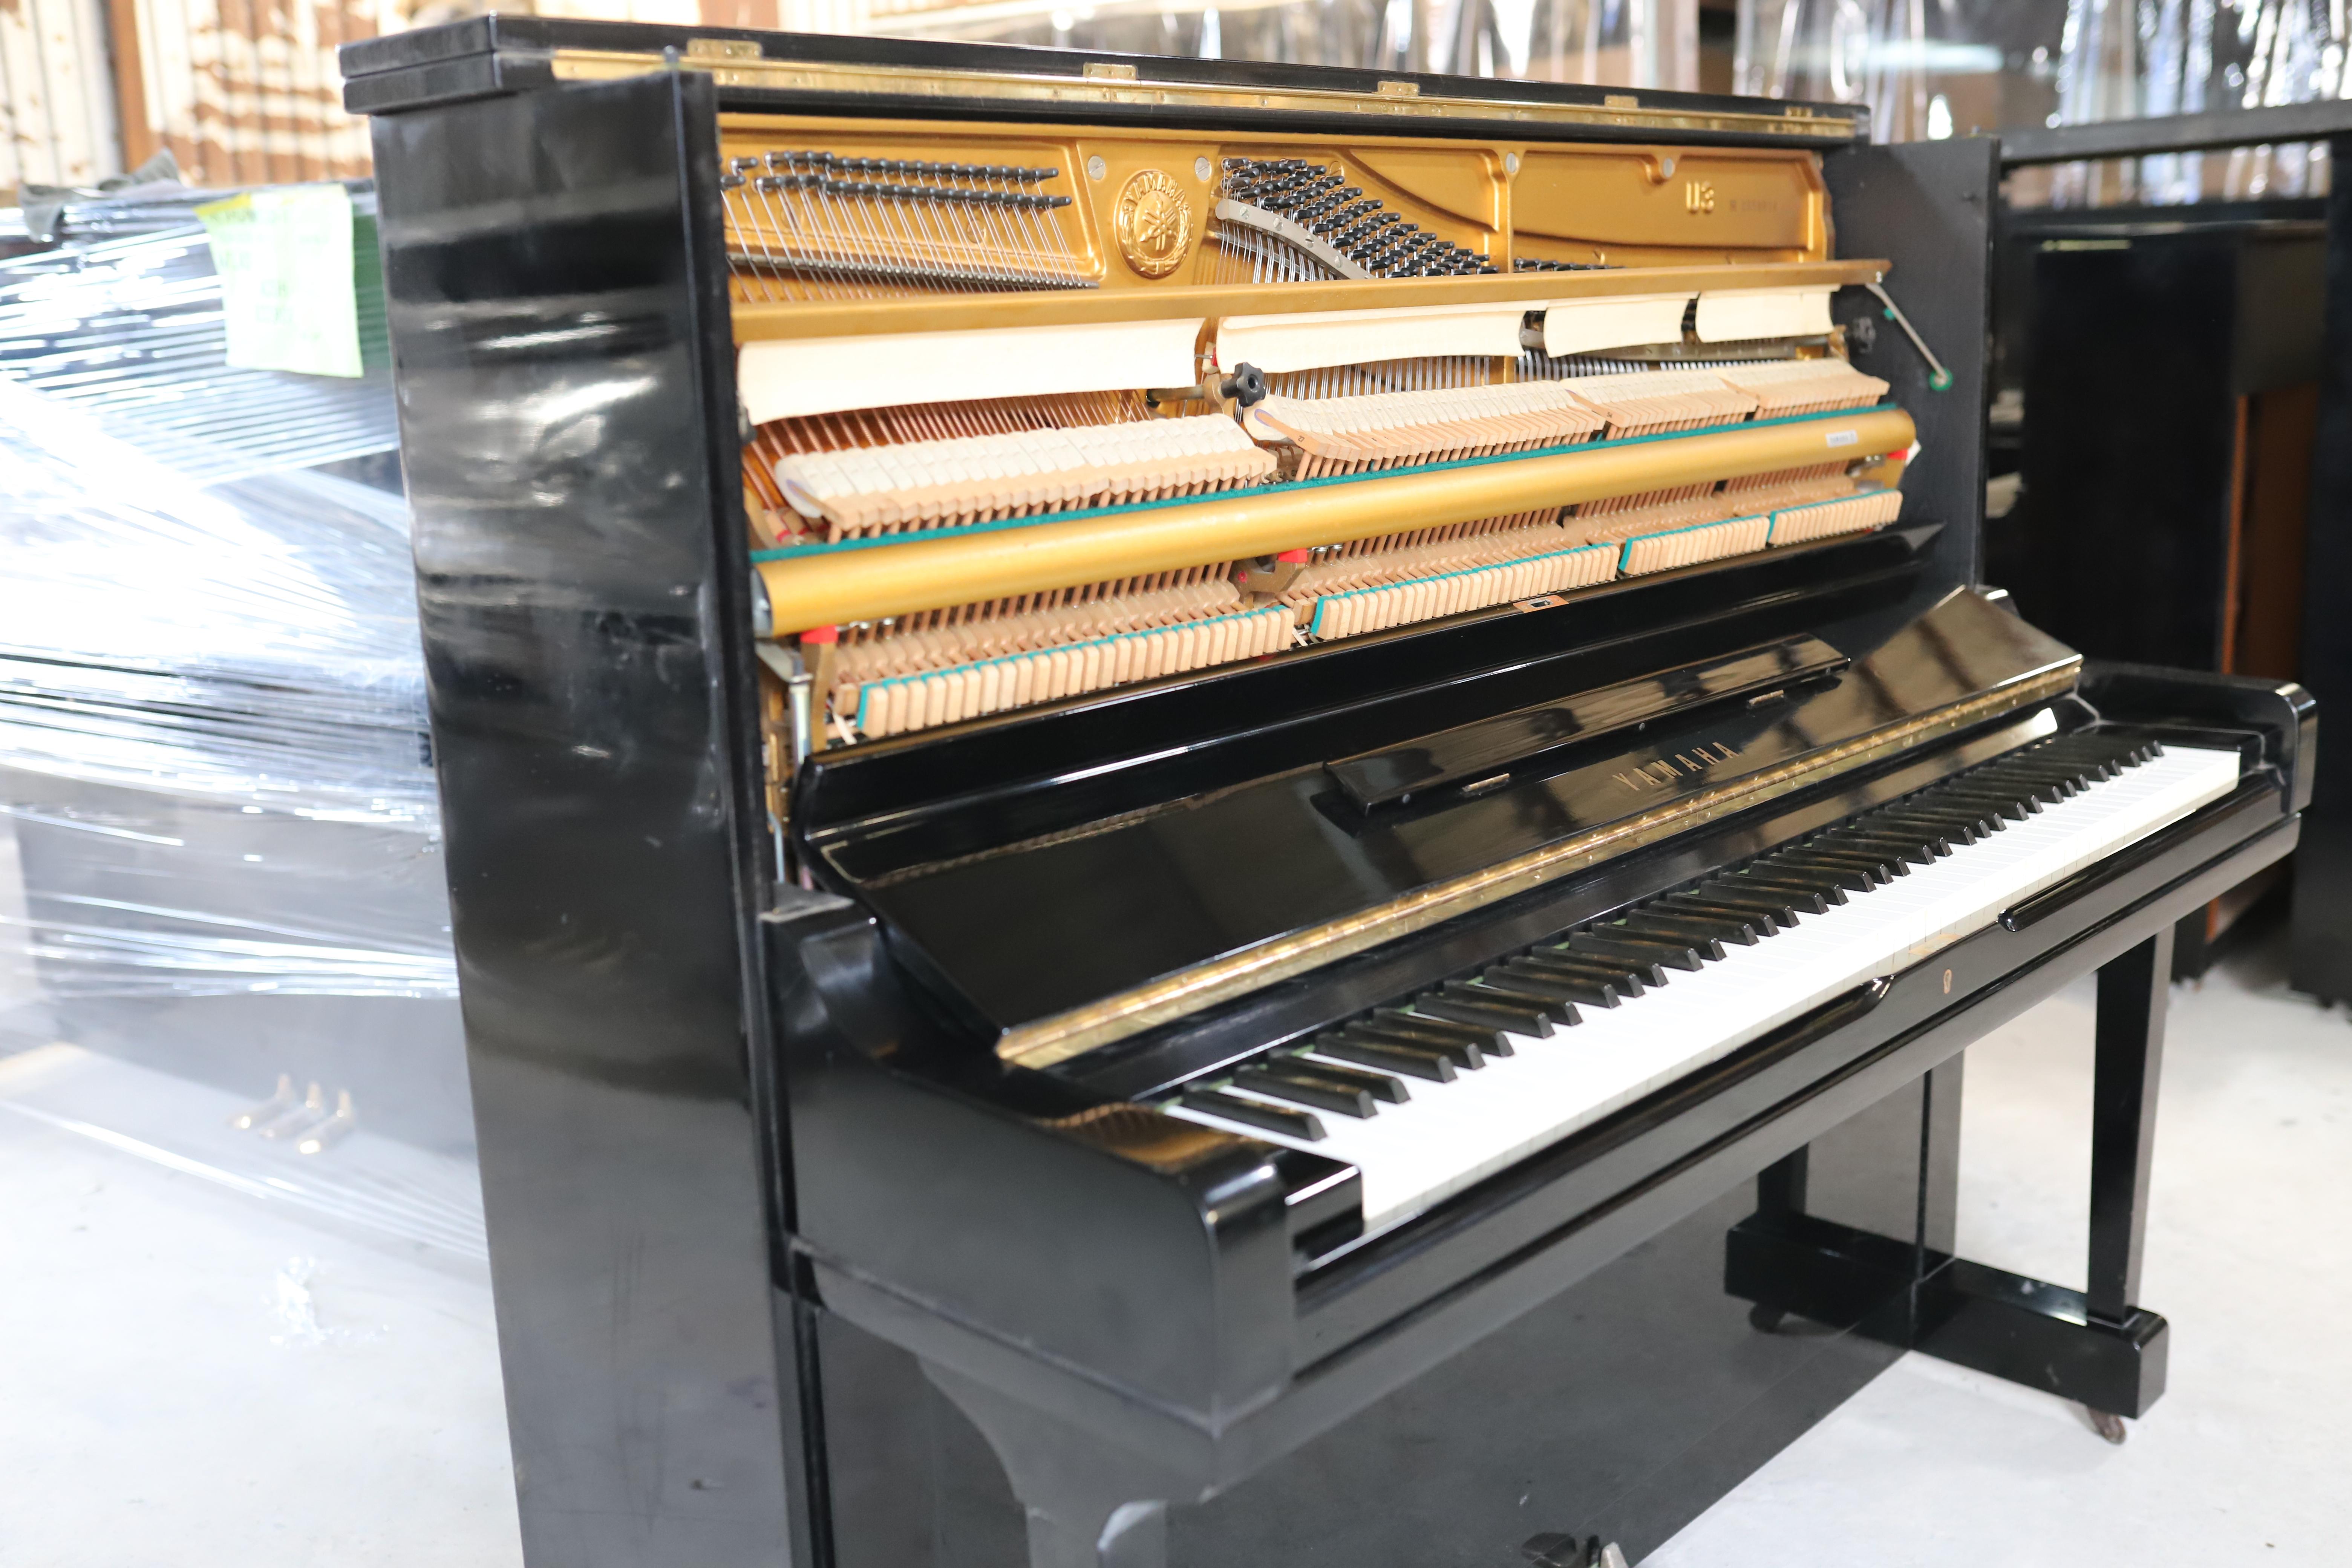 piano_cơ_yamaha_u2g